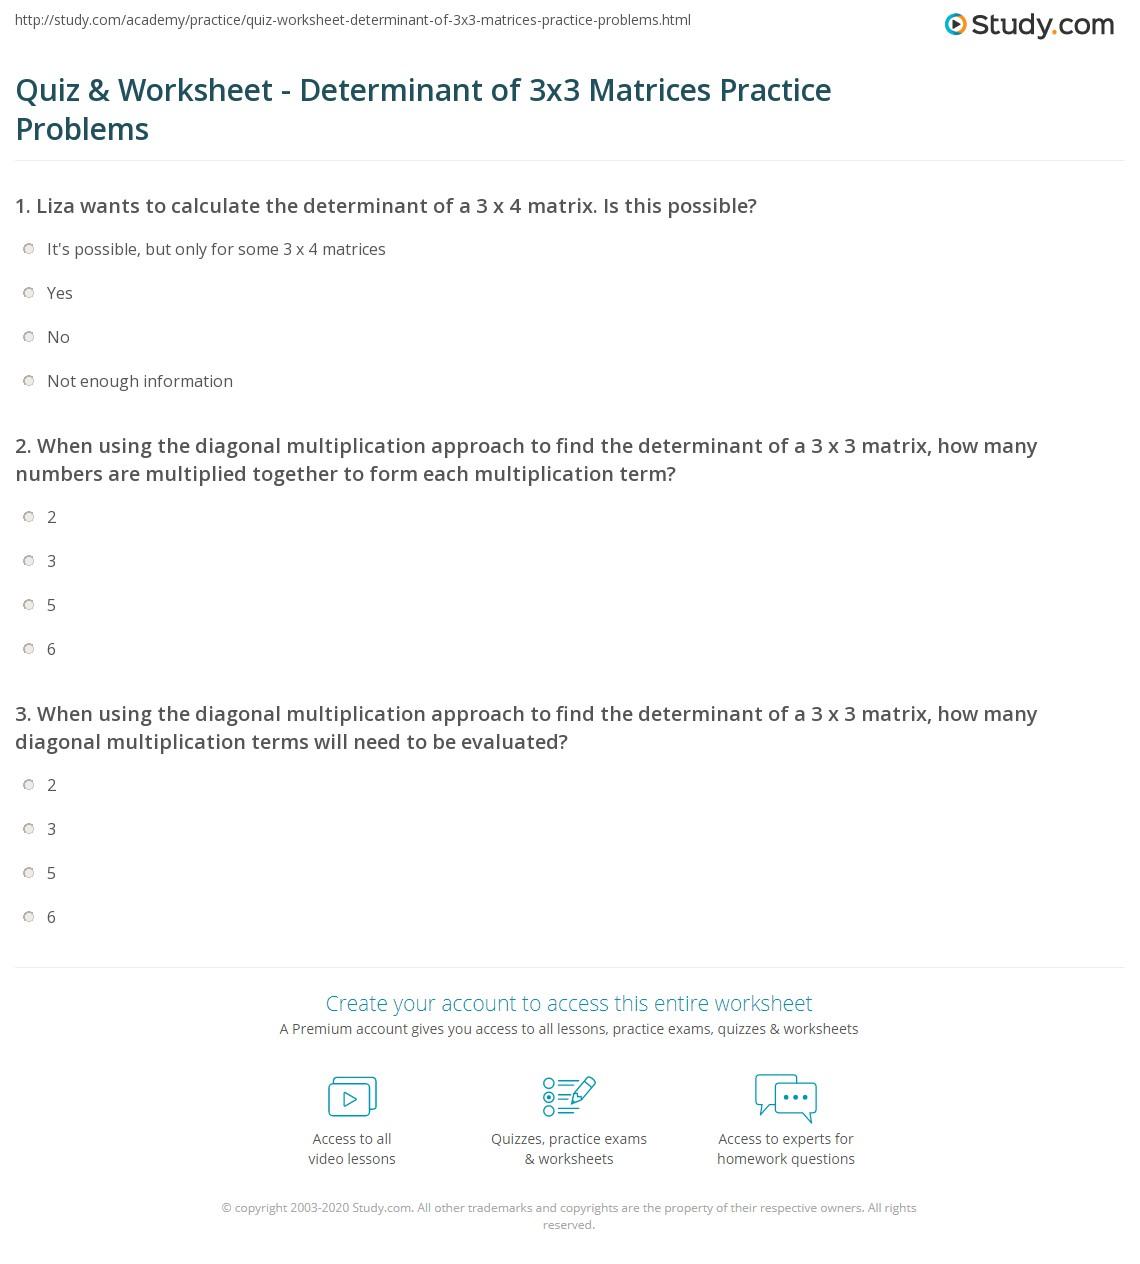 worksheet Matrix Determinant Worksheet quiz worksheet determinant of 3x3 matrices practice problems print finding the a matrix worksheet